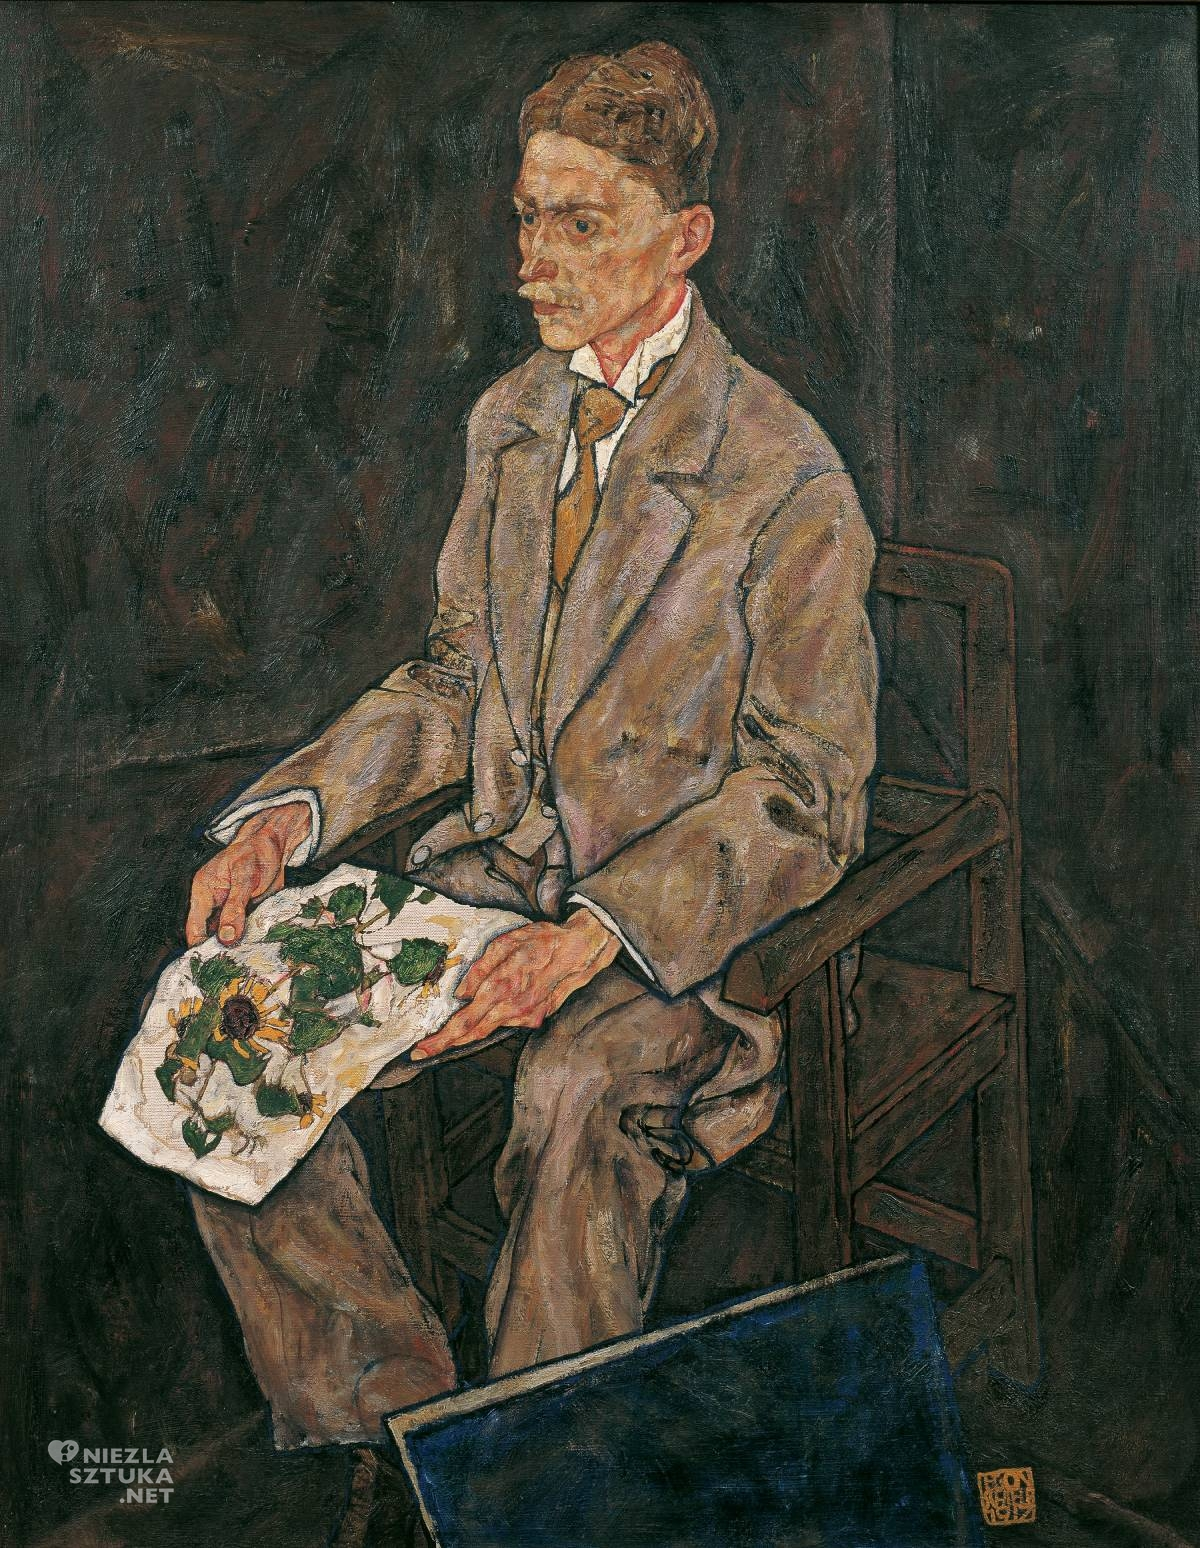 Egon Schiele, Doktor Martin Haberditzl, portret, historyk sztuki, dyrektor muzeum, Niezła Sztuka